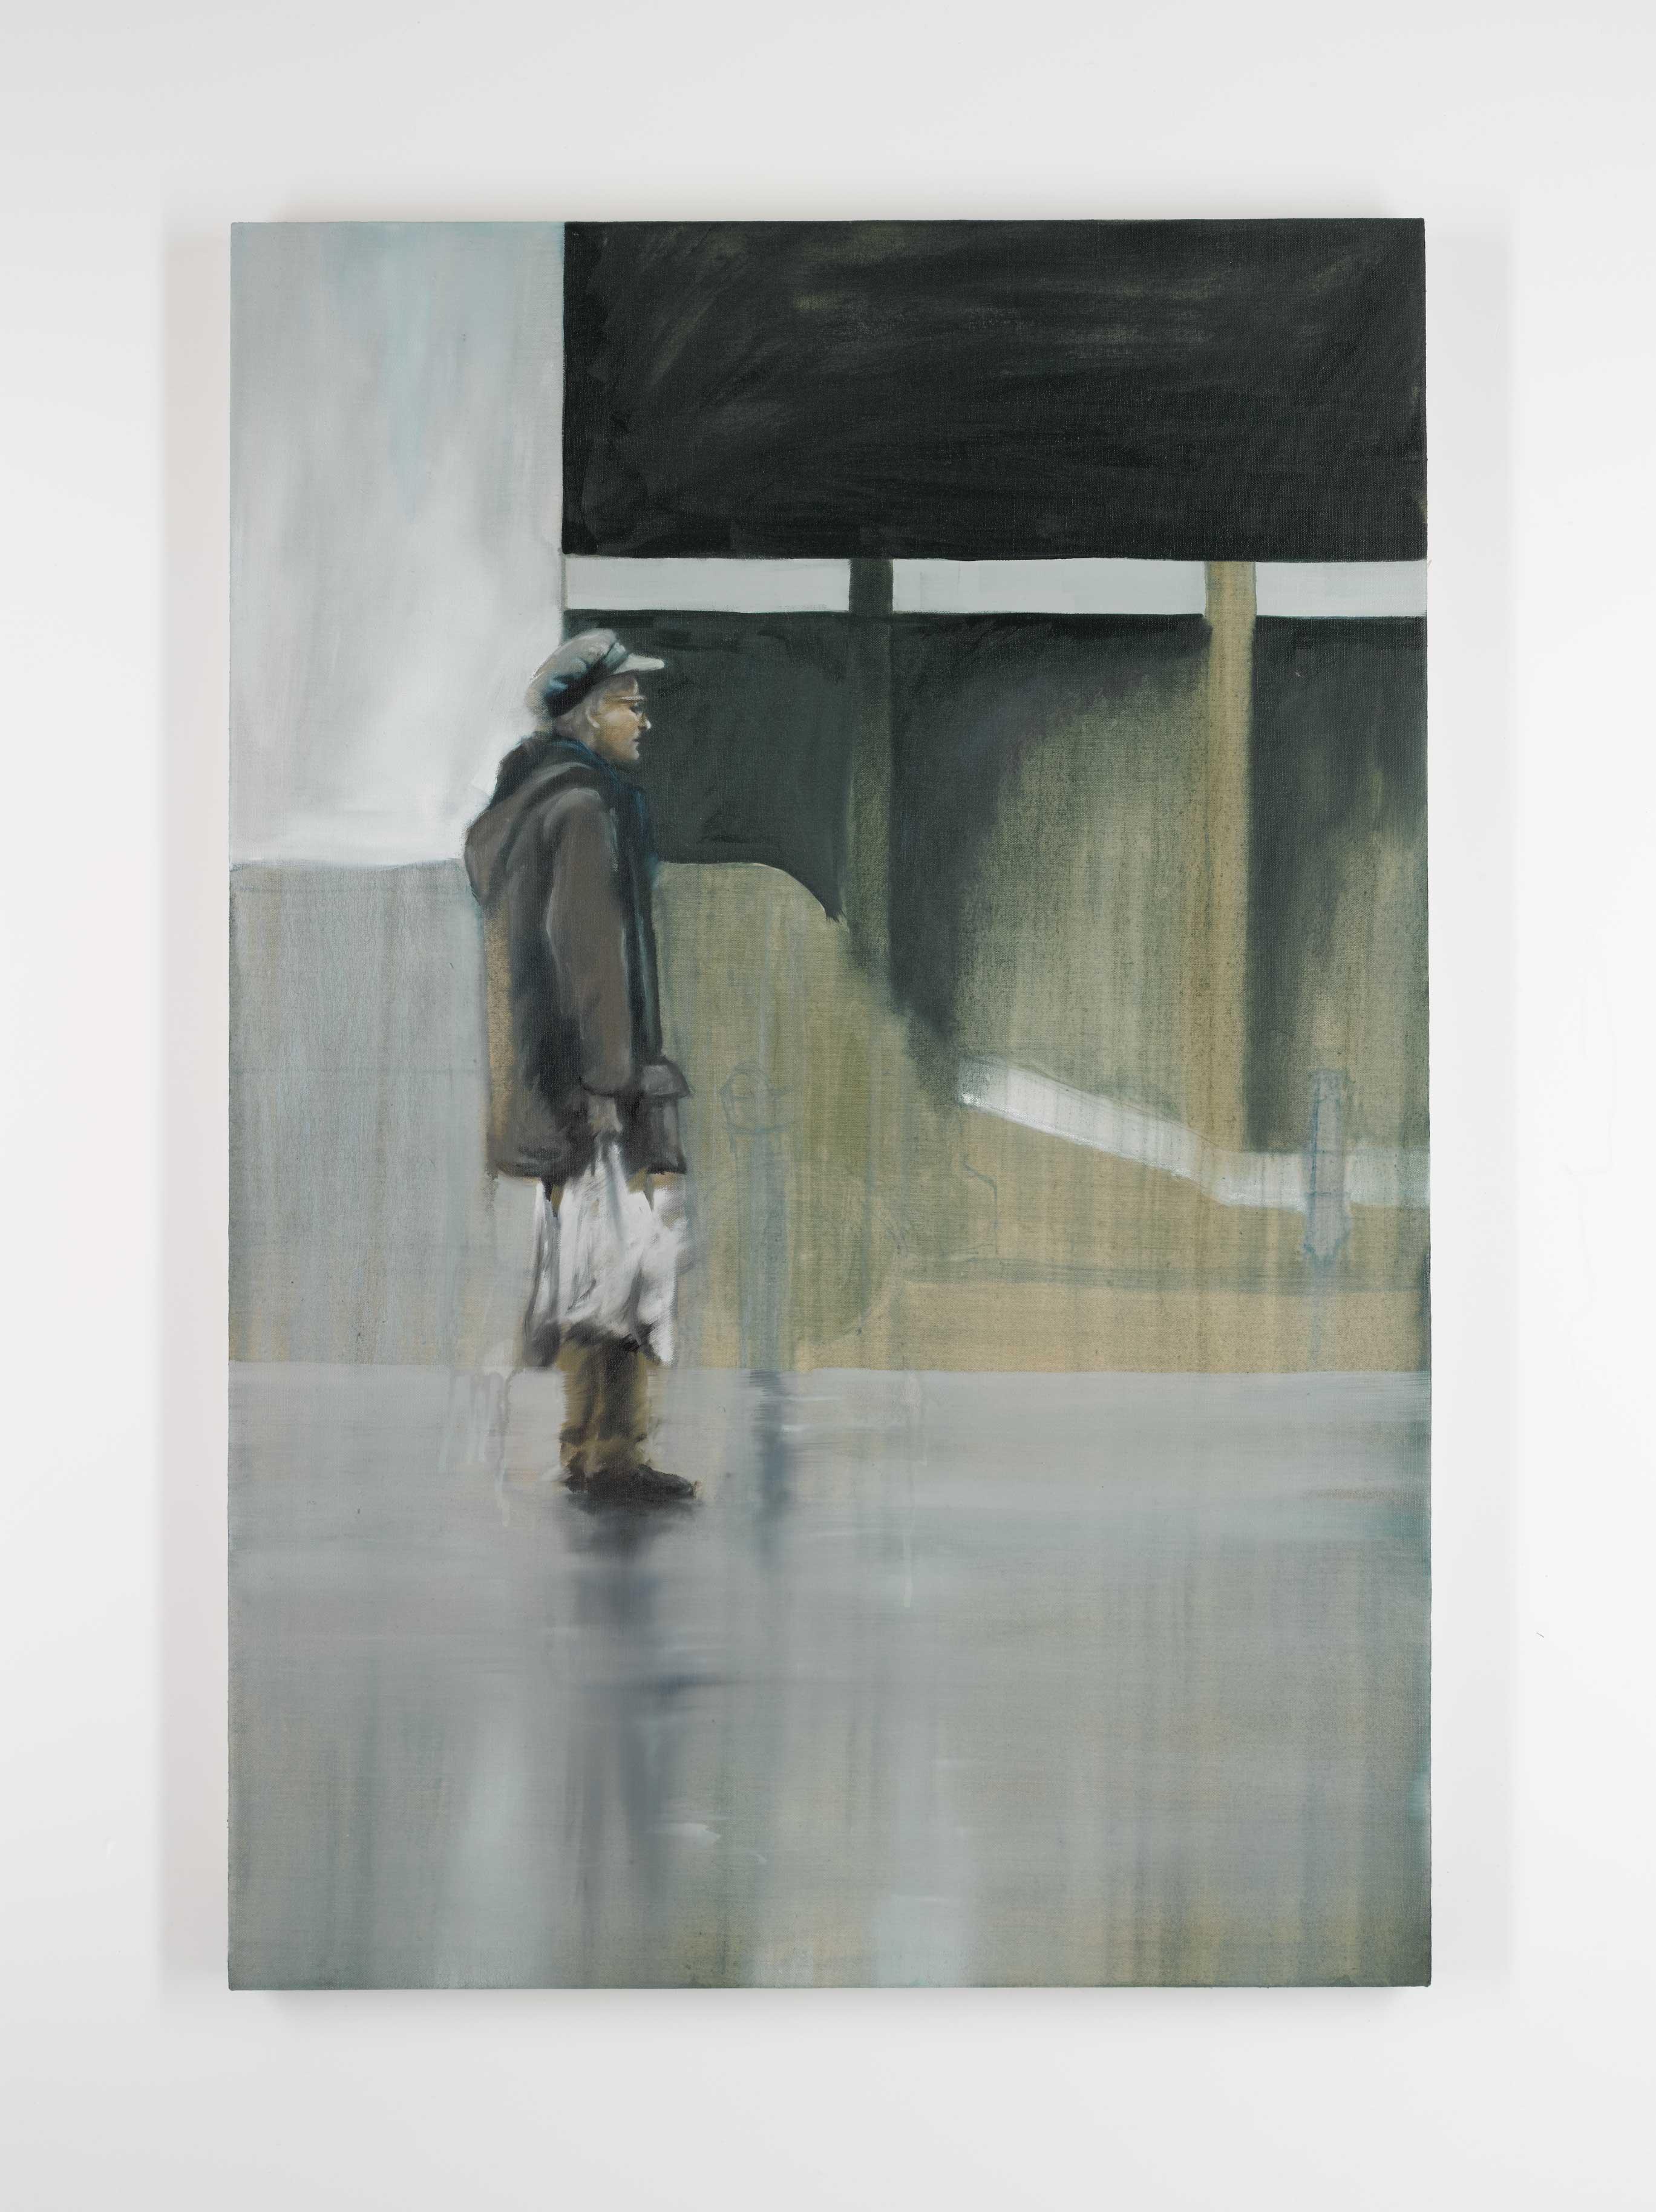 Wardour man 90x70 cm oil on canvas © Austen O'Hanlon